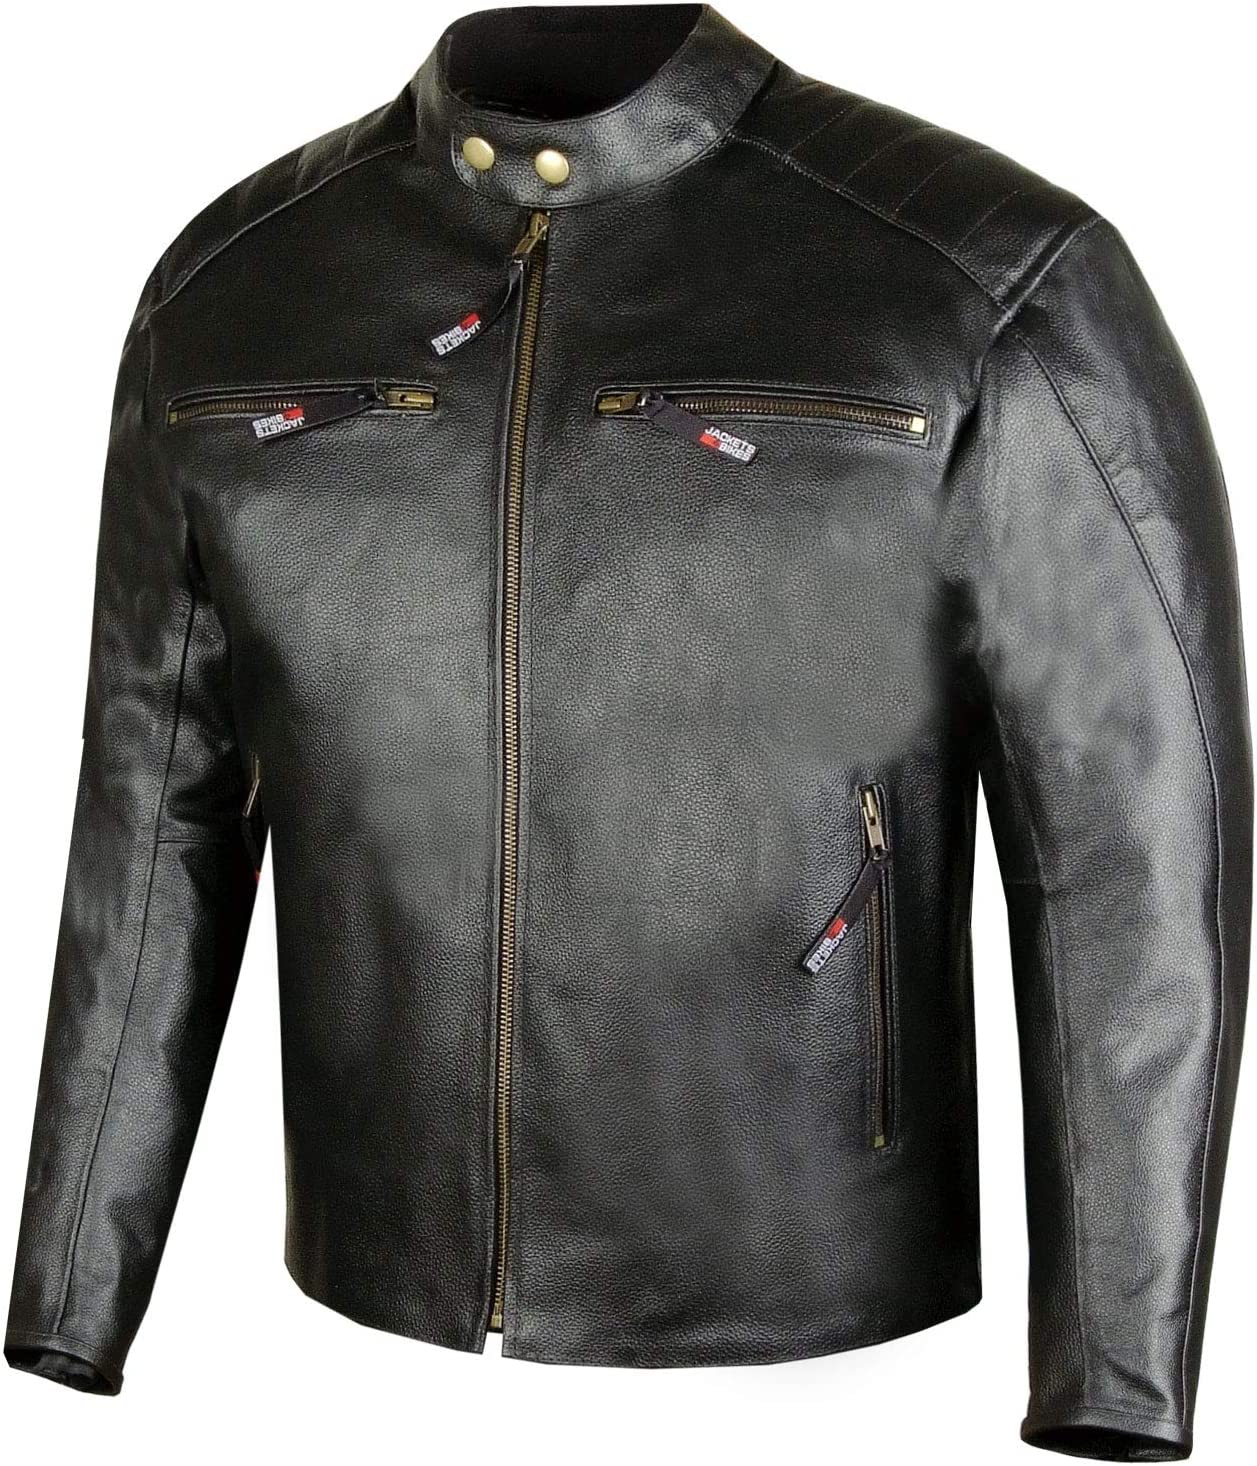 Men Defender Premium Leather Motorcycle Street Cruiser Biker CE Armor Jacket L